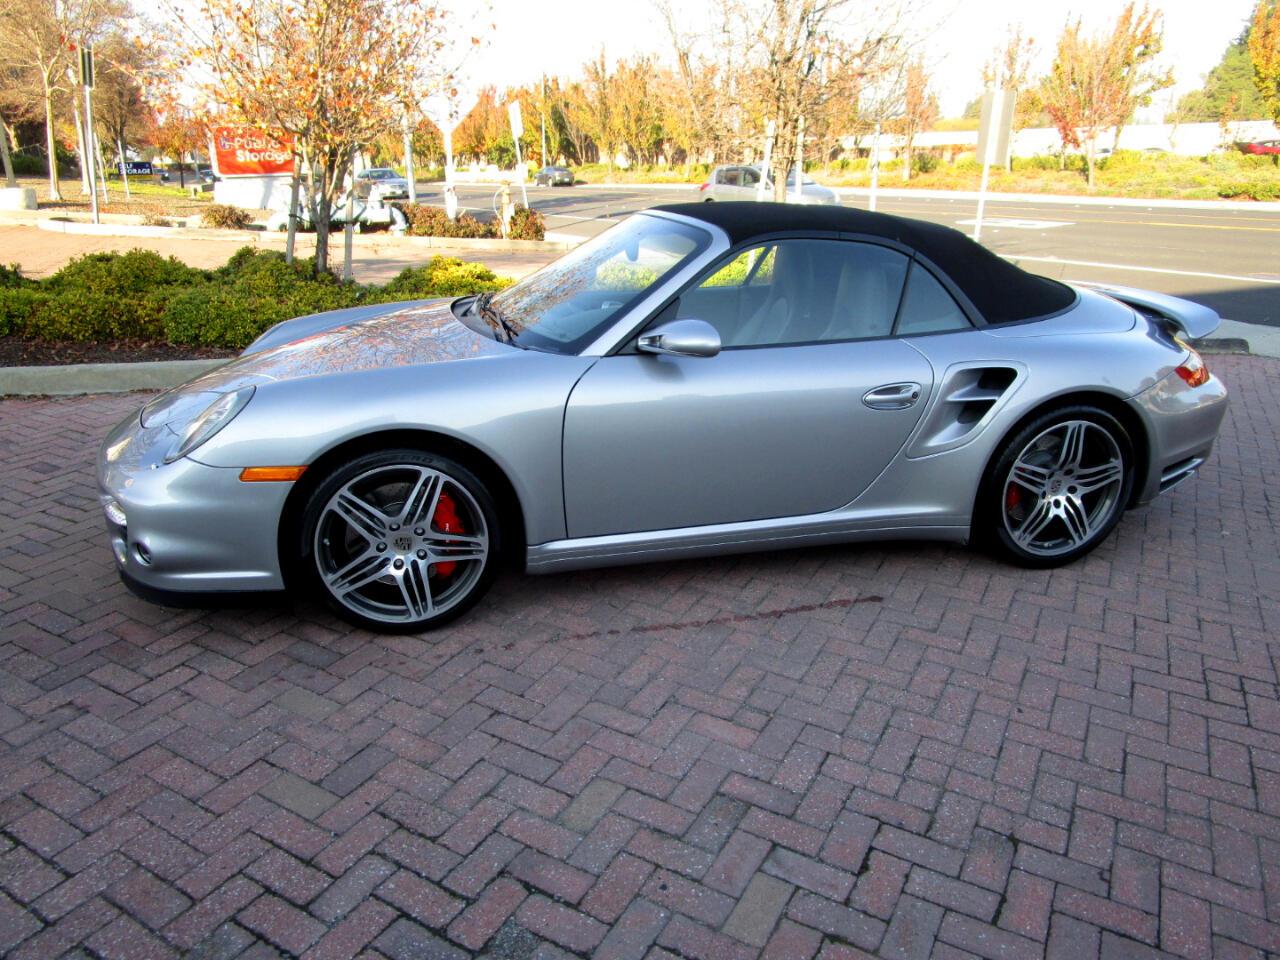 2008 Porsche 911 Turbo ONE OWNER**AUTO*NAV*PWR LTHR SEATS**PWR TOP**